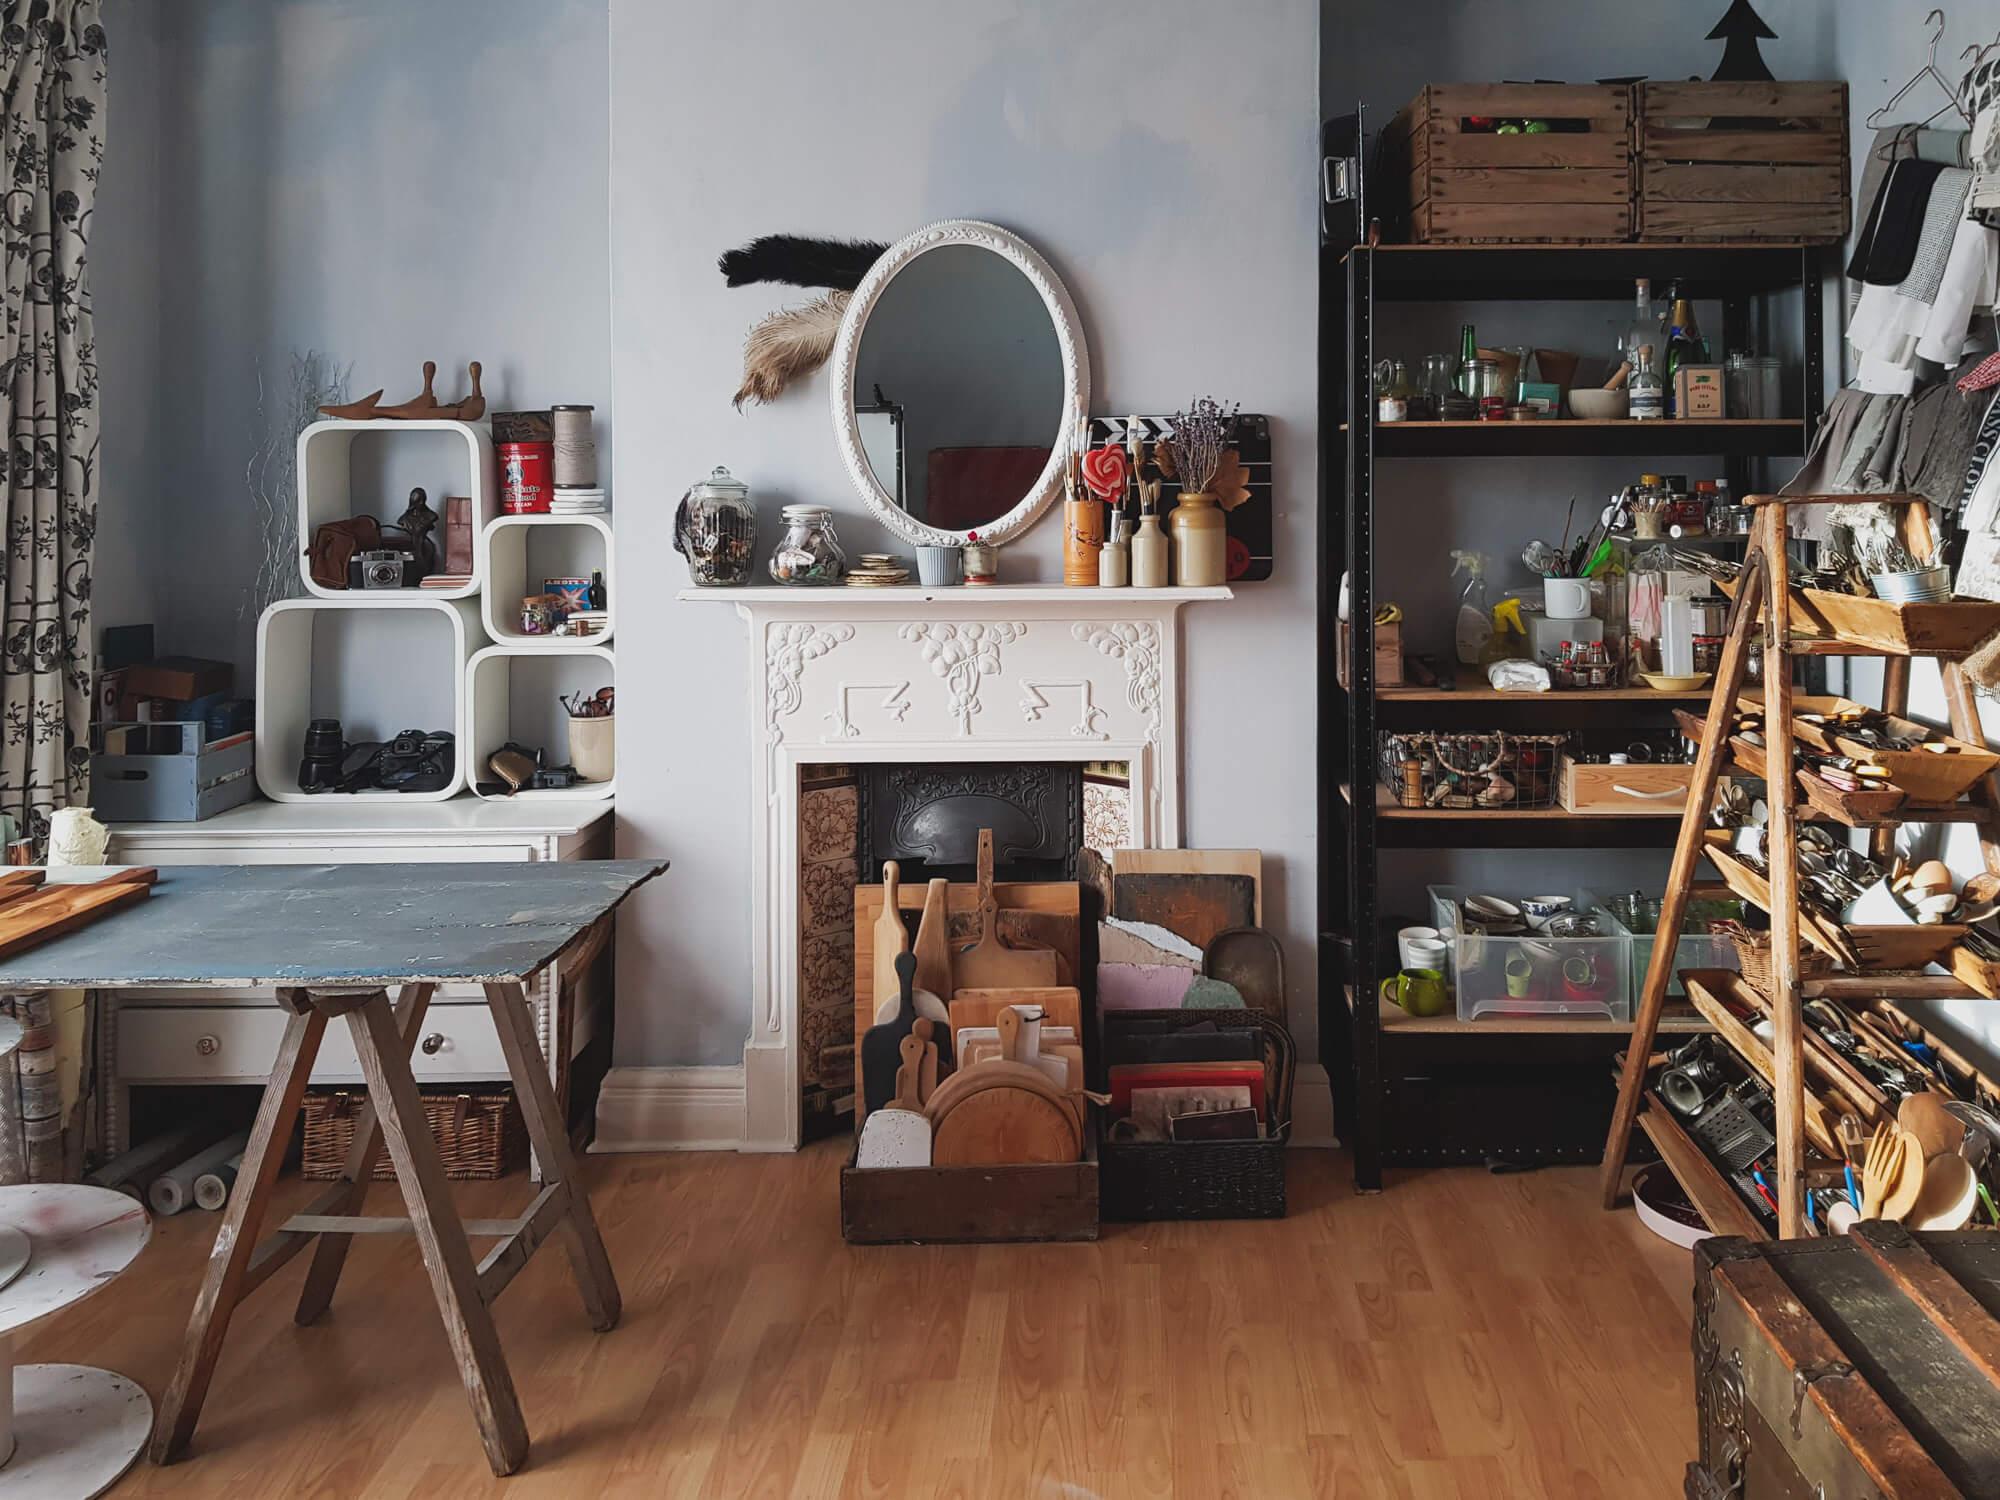 Studio, Dorset-Photographer